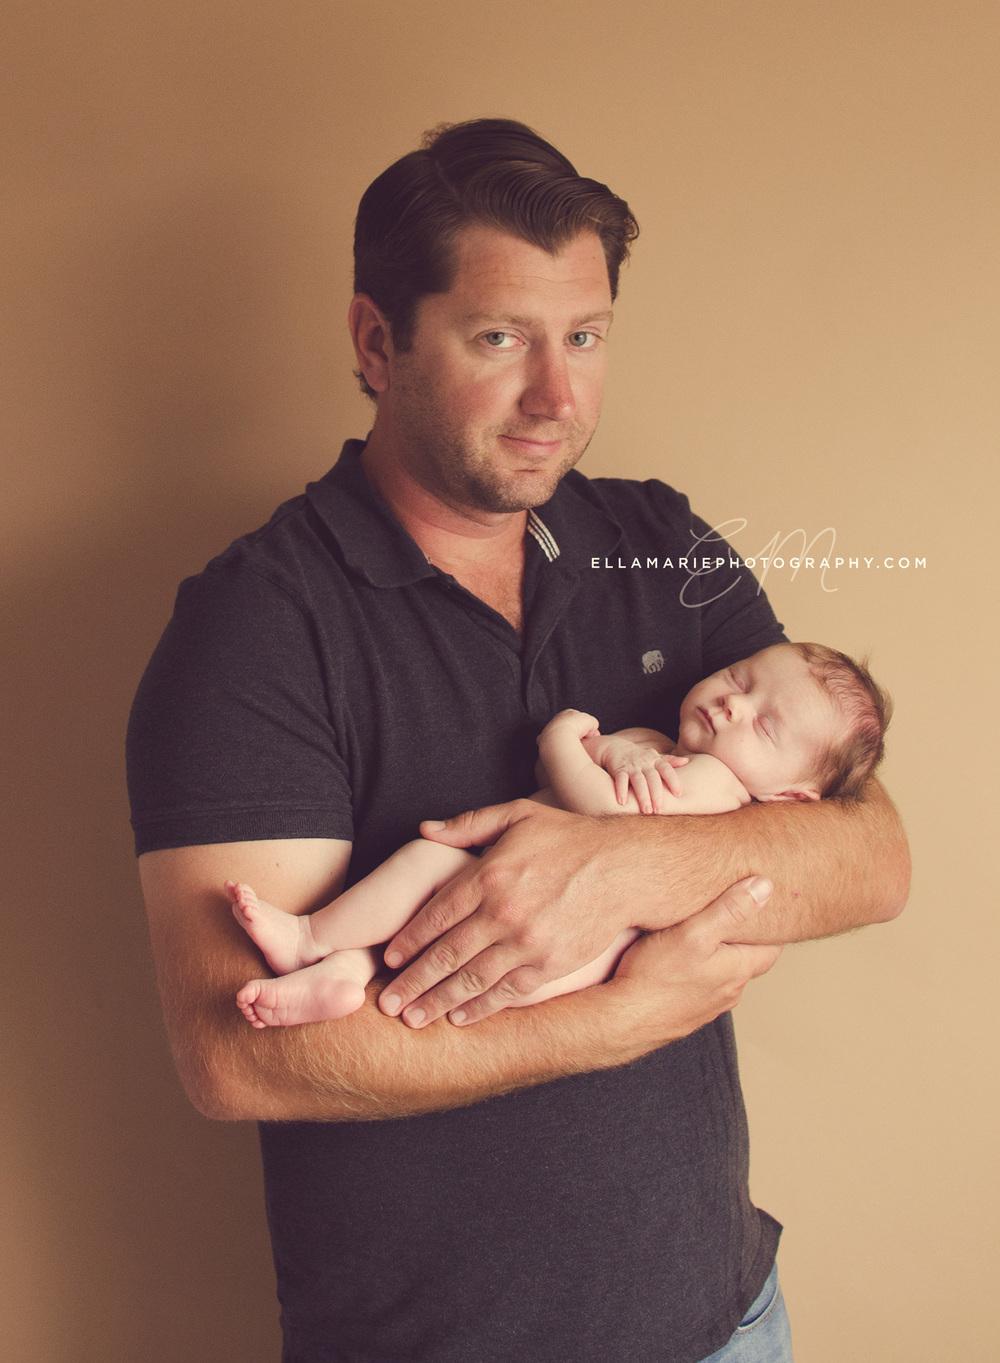 EllaMariePhotography_newborn_maternity_baby_infant_Baden_ON_New_Hamburg_Stratford_Waterloo_Kitchener_Guelph_Cambridge_Listowel_photographer_photography_07.jpg